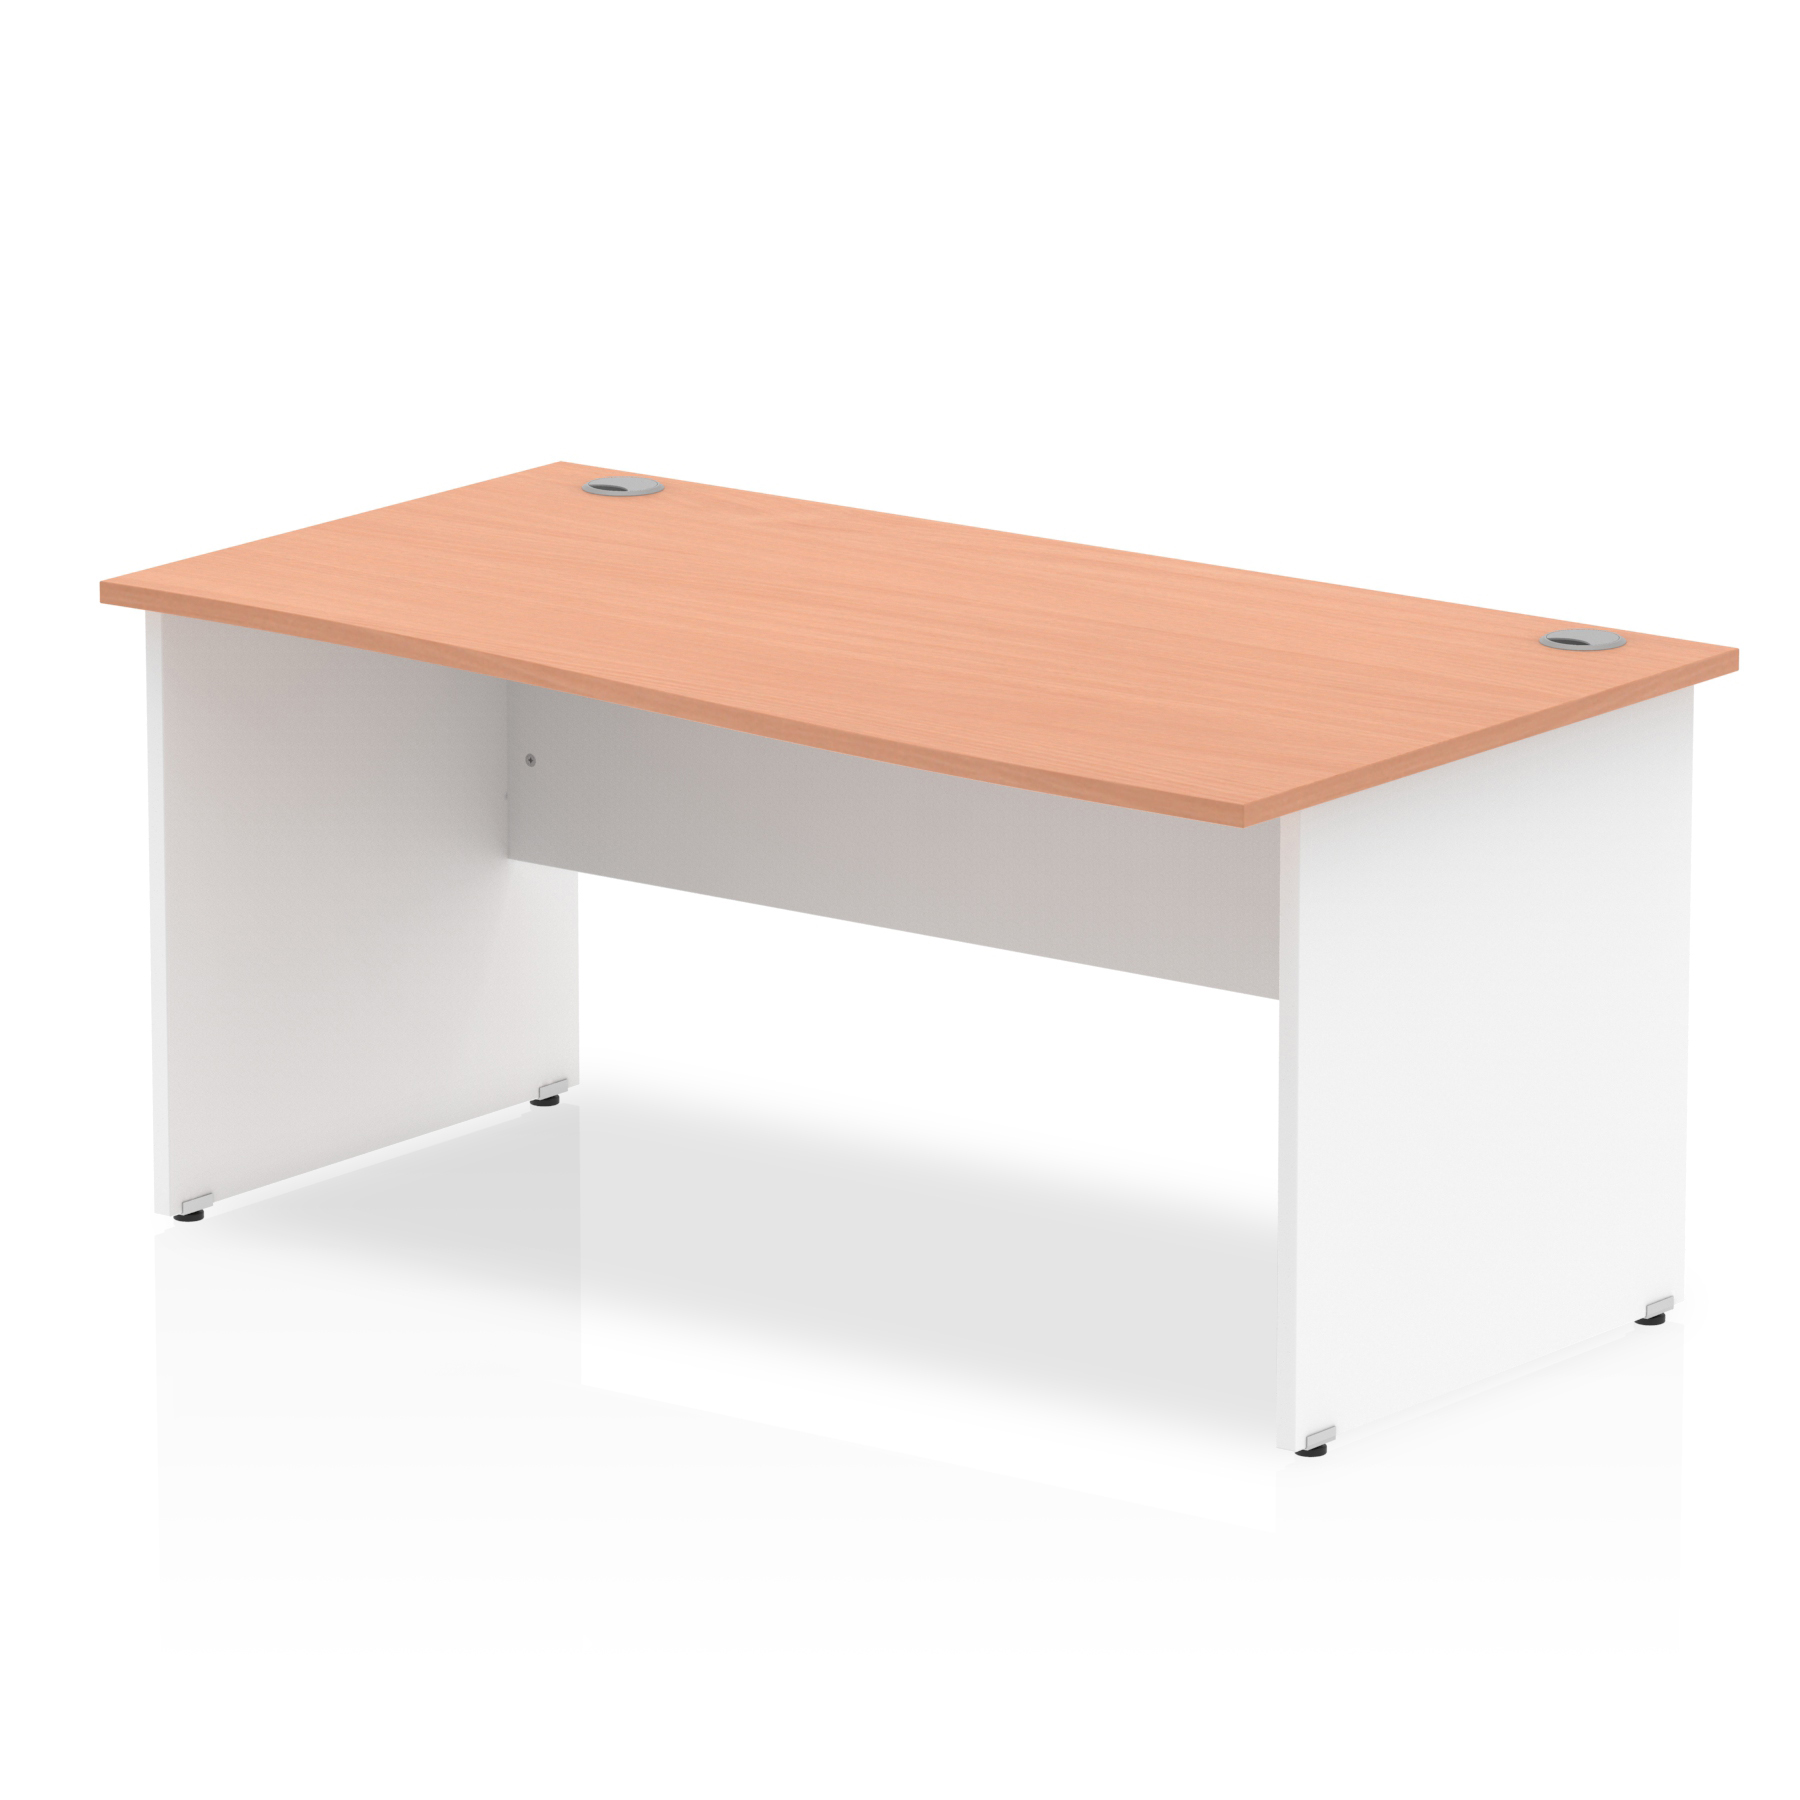 Trexus Desk Wave Right Hand Panel End 1600x800mm Beech Top White Panels Ref TT000069